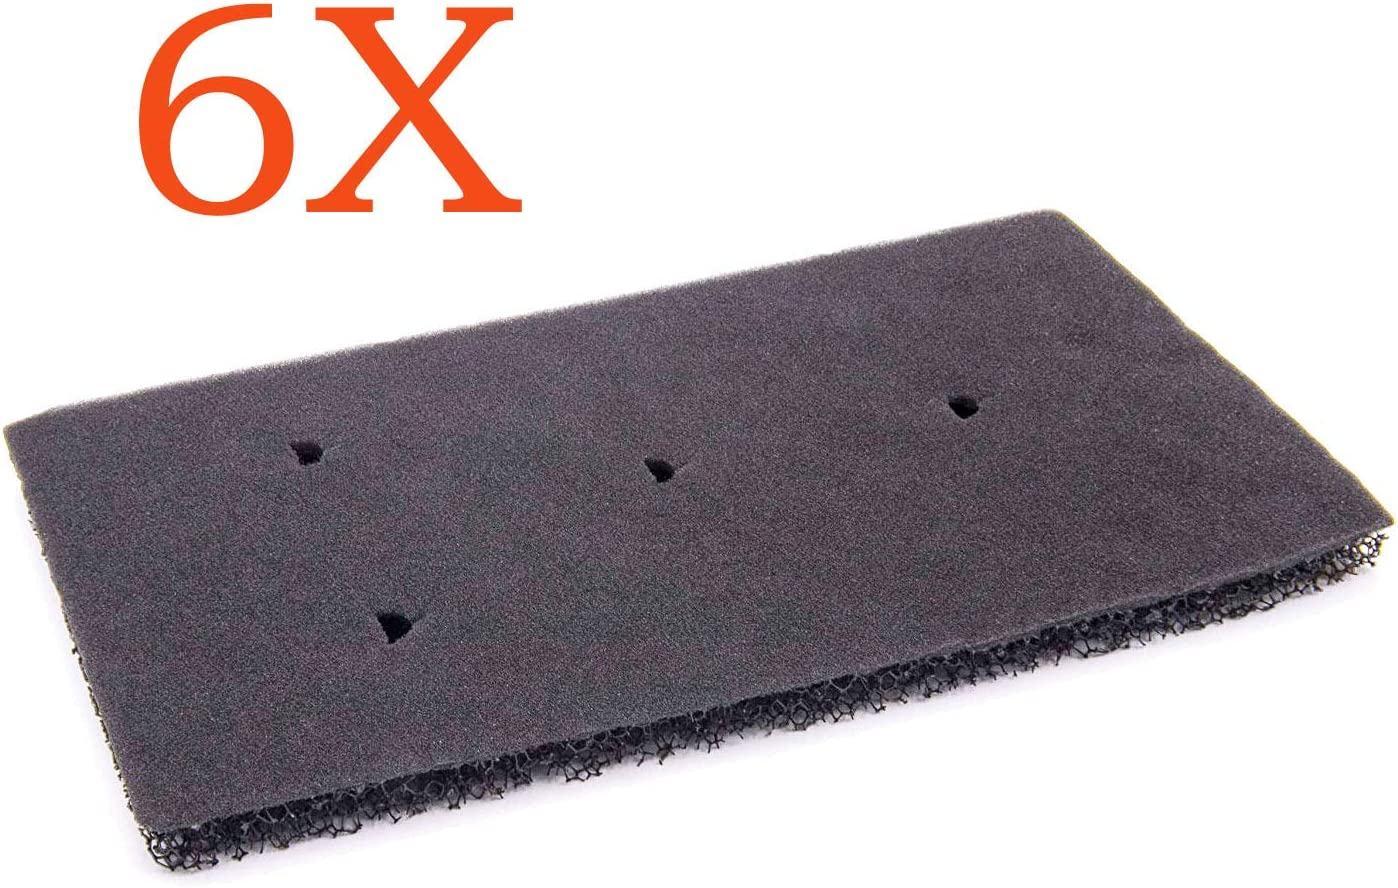 6x HX Filter f/ür 8015250474909 Bauknecht Privileg Whirlpool 481010716911